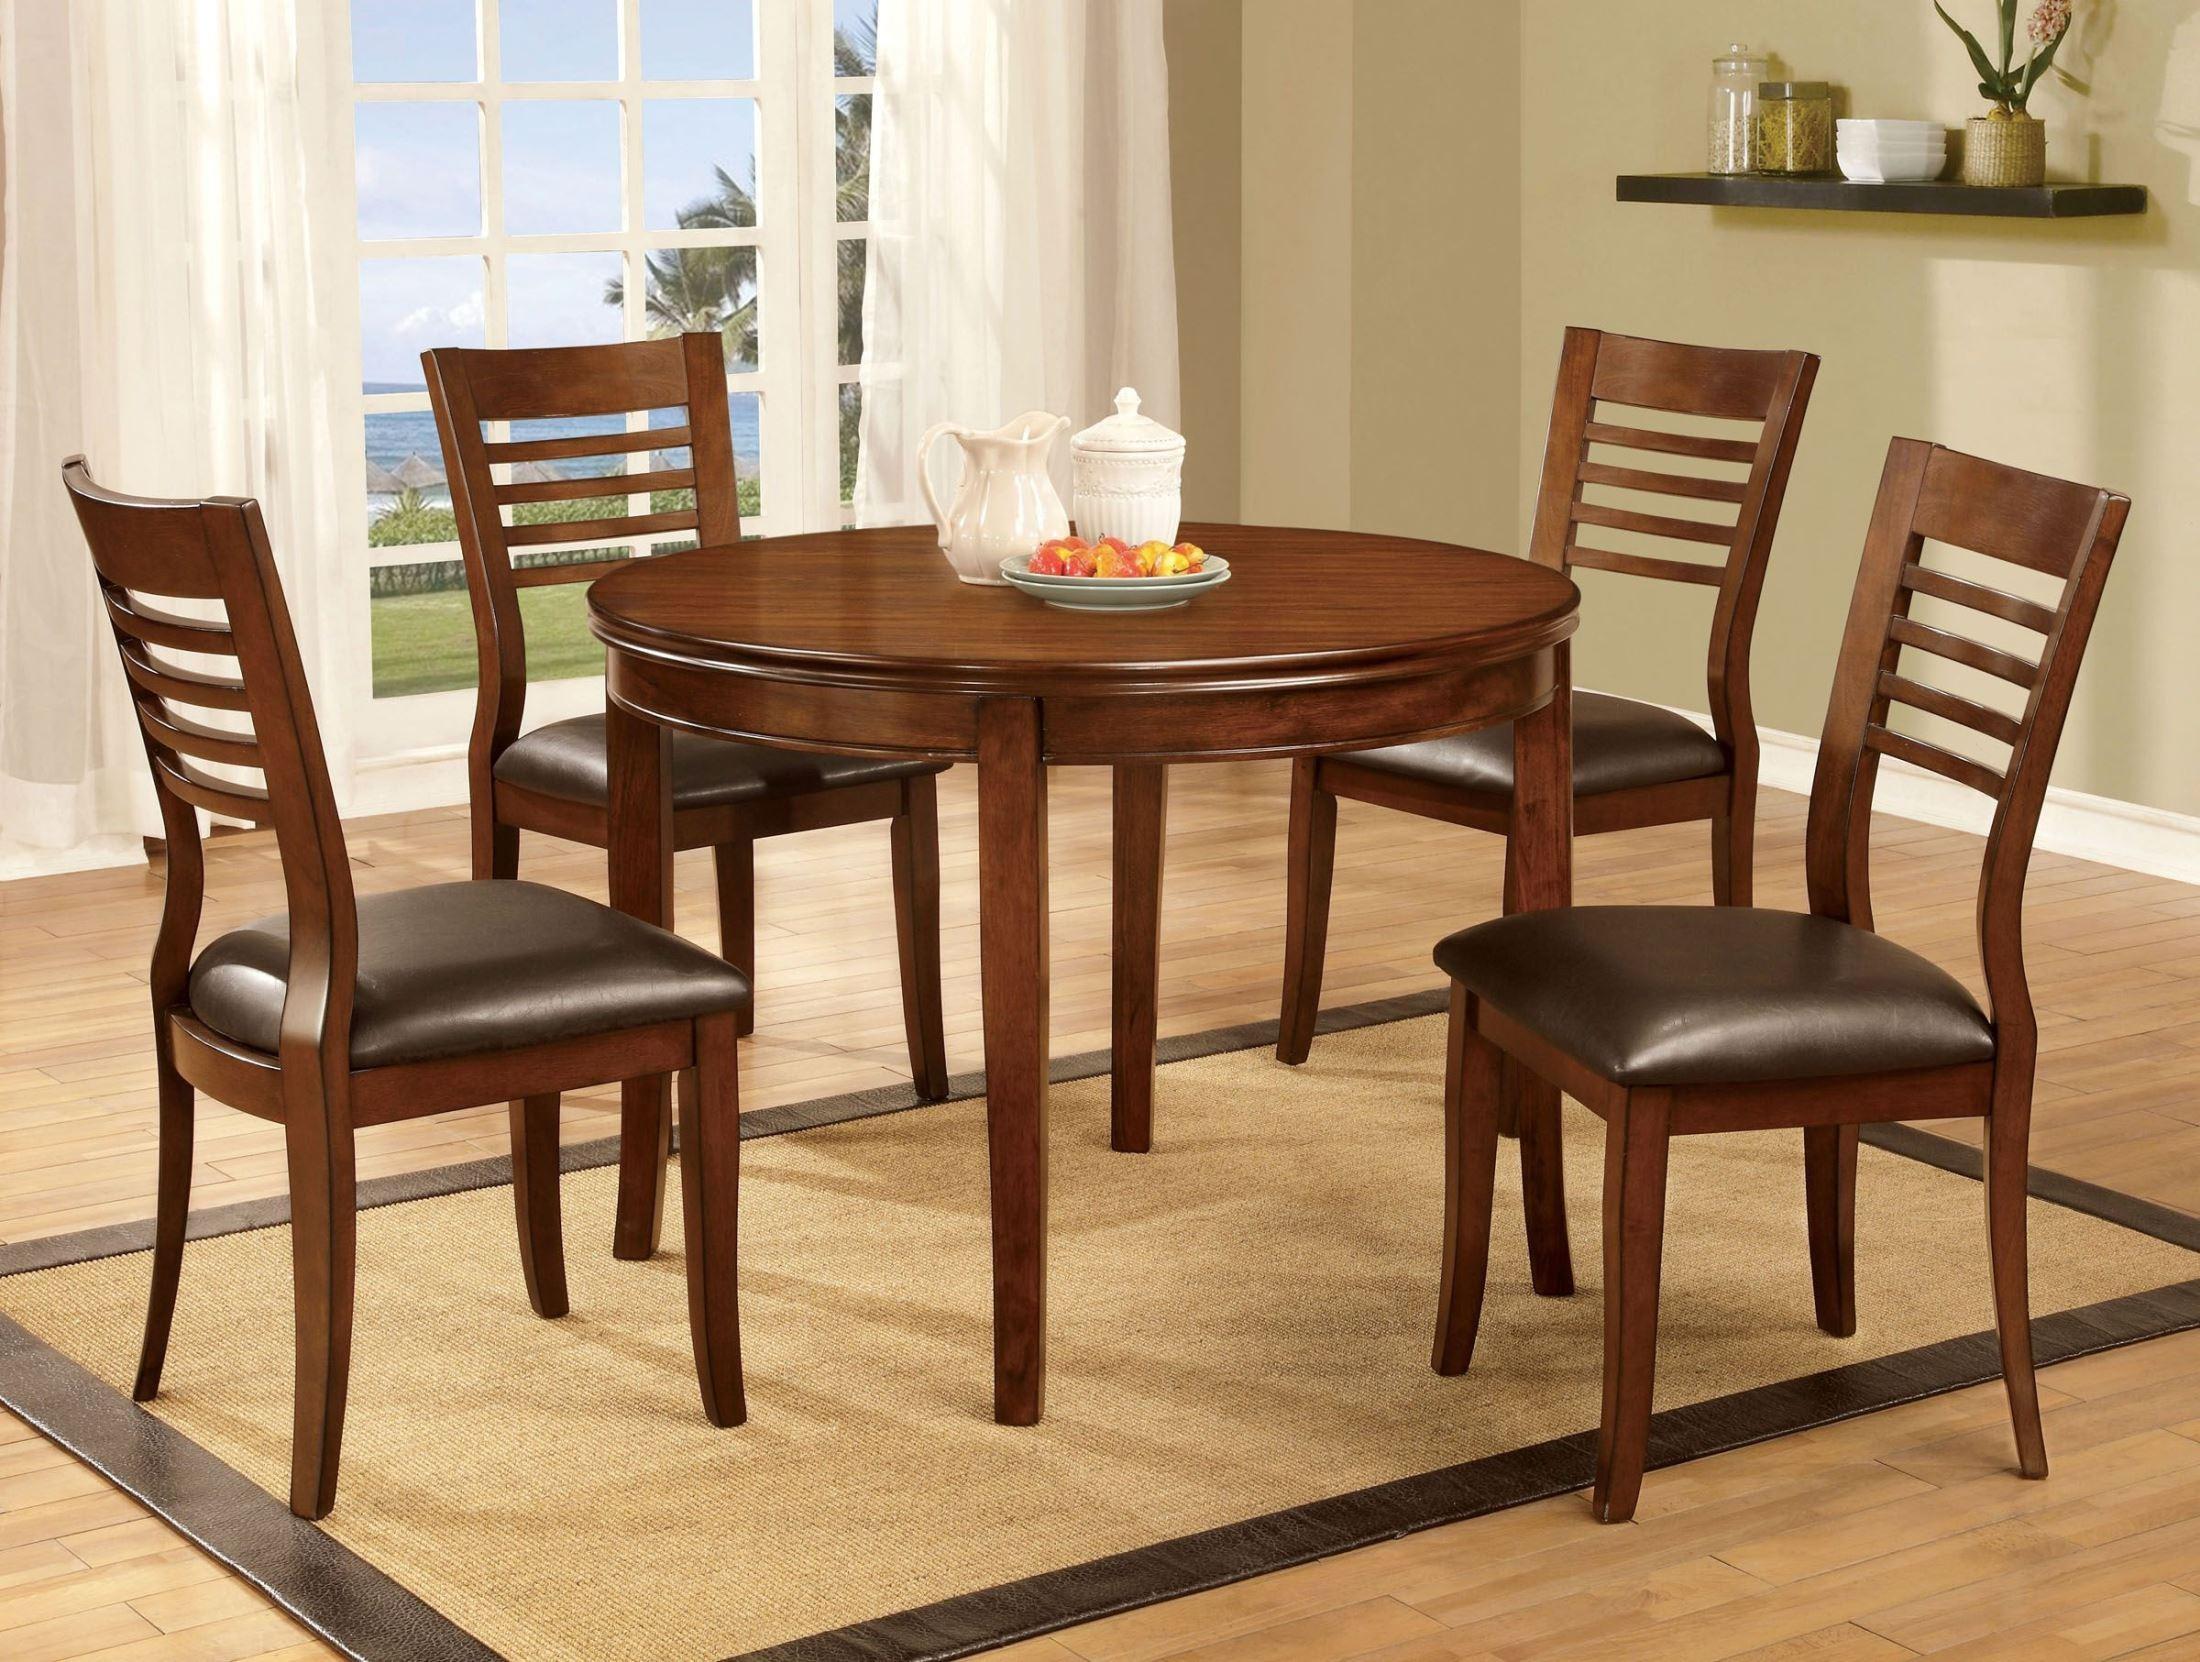 dwight i medium oak round dining room set cm3988rt furniture of america. Black Bedroom Furniture Sets. Home Design Ideas